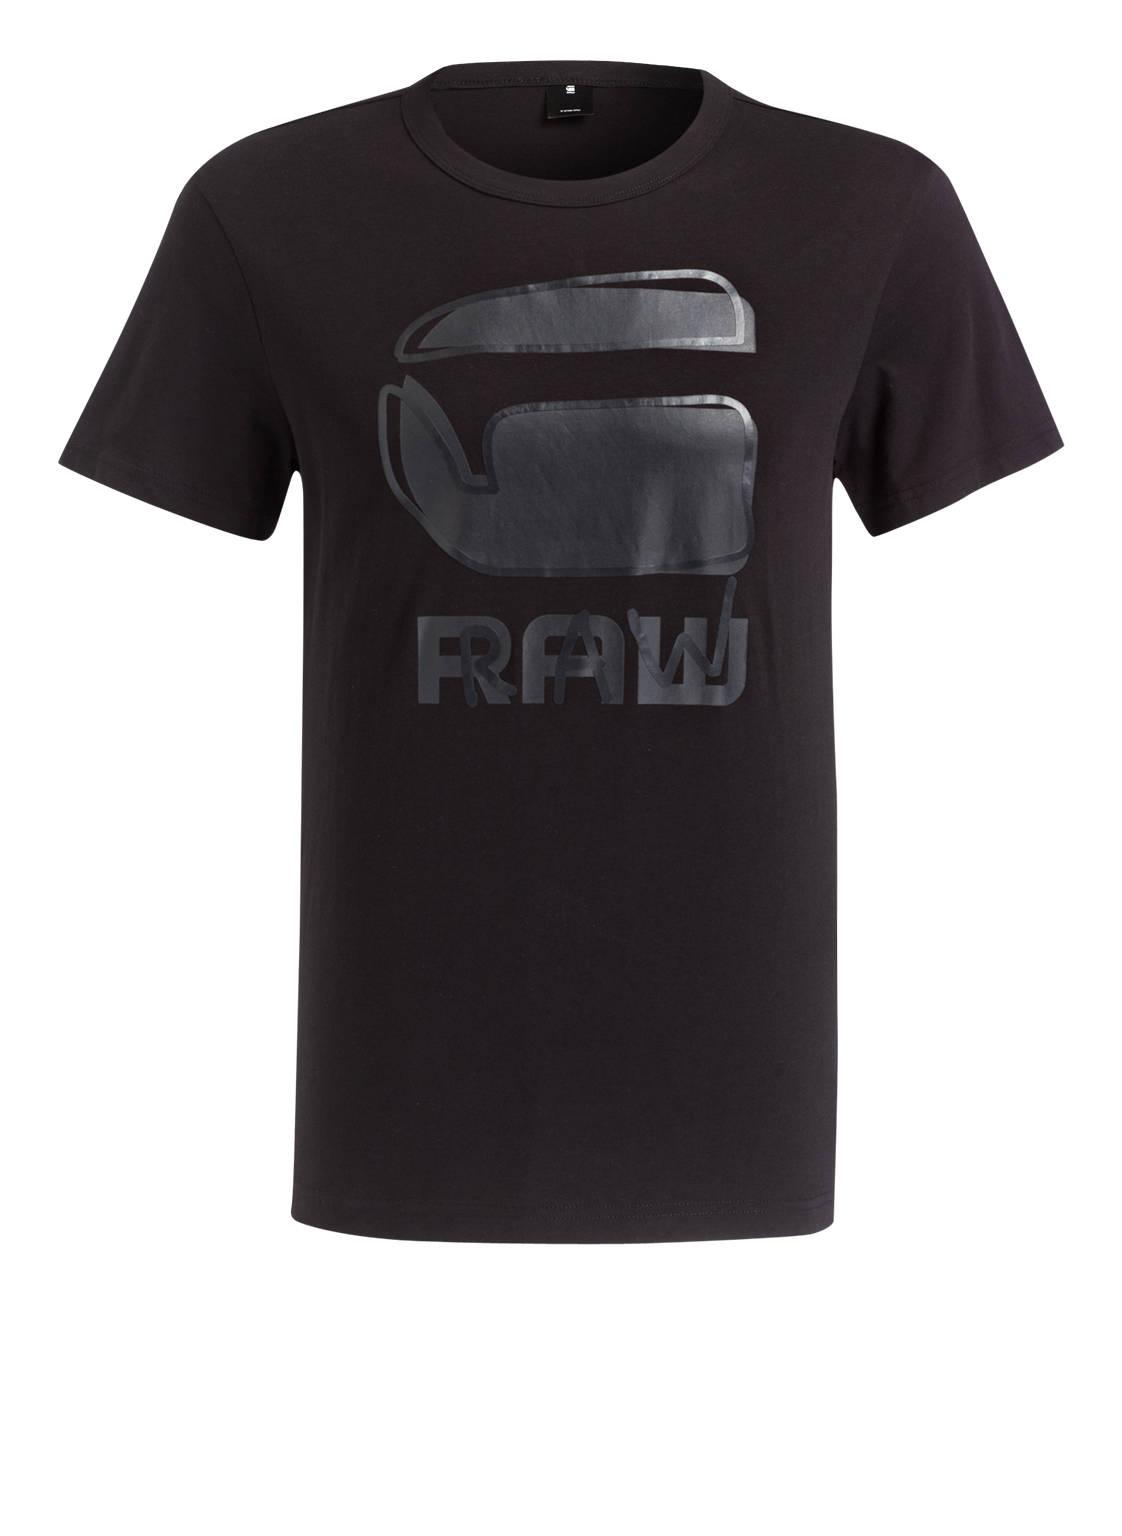 g star raw t shirt razzarro mit monochromem print schwarz. Black Bedroom Furniture Sets. Home Design Ideas